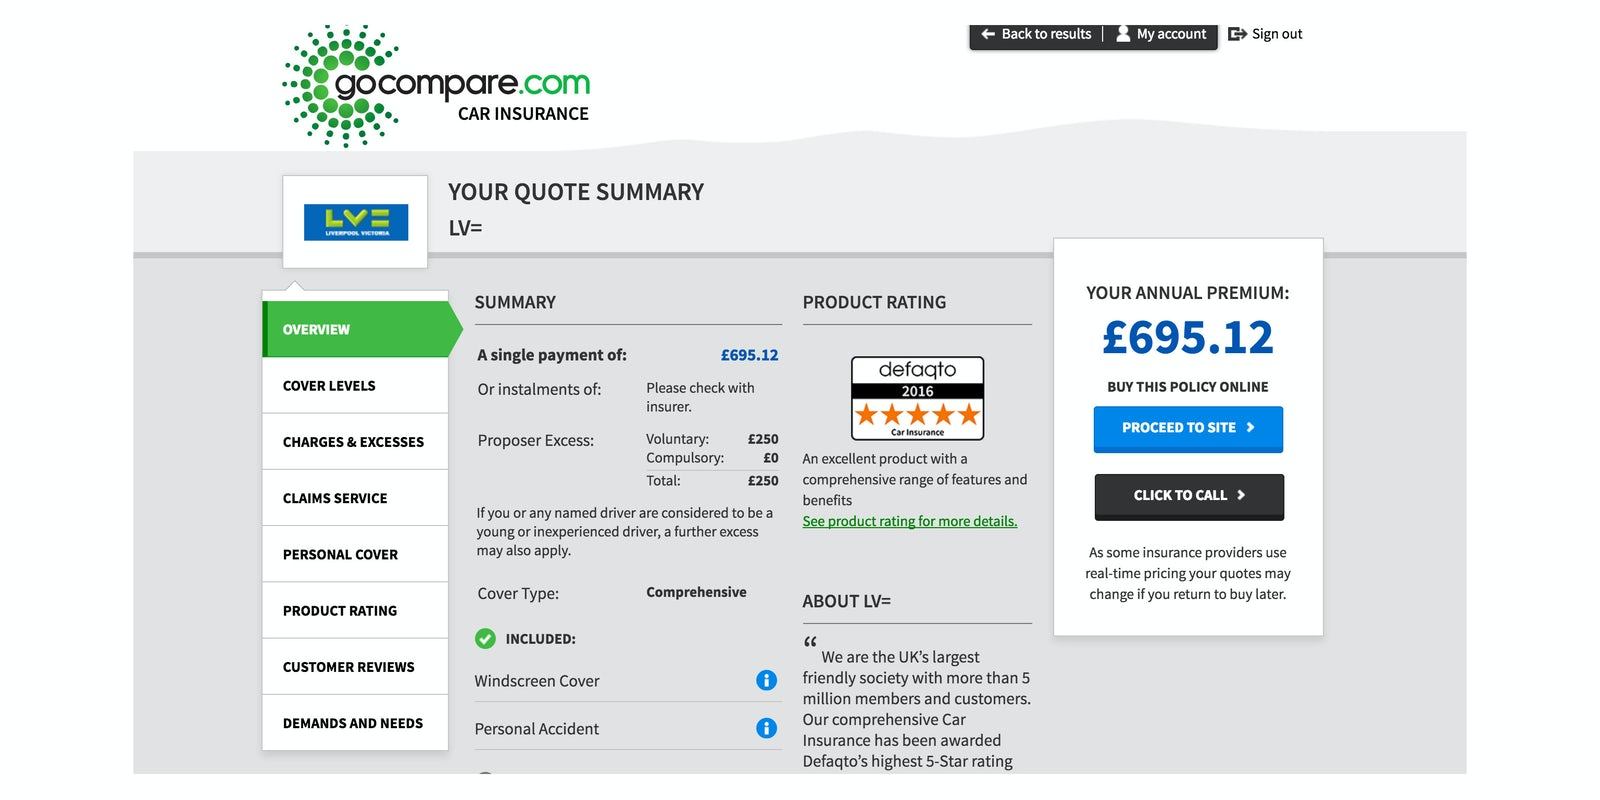 Go Compare Car Insurance Retrieve Quotes 44billionlater